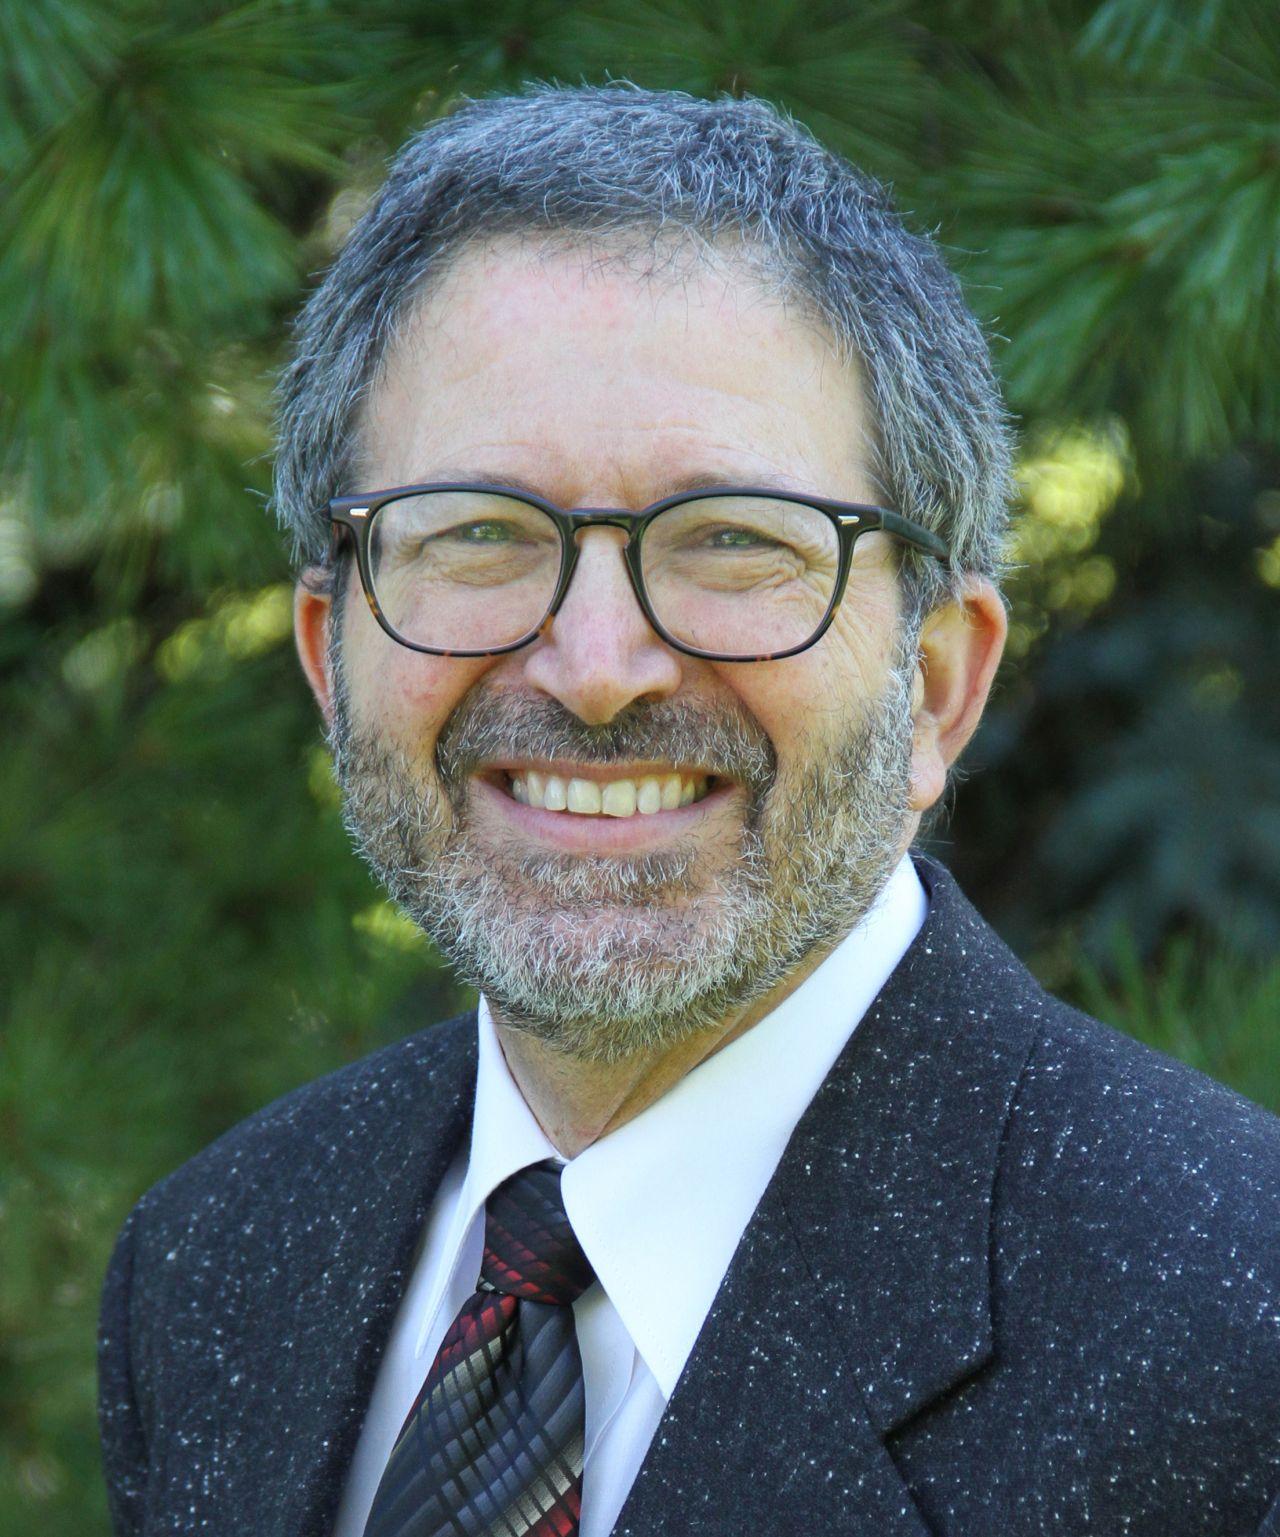 Joel Goldberg